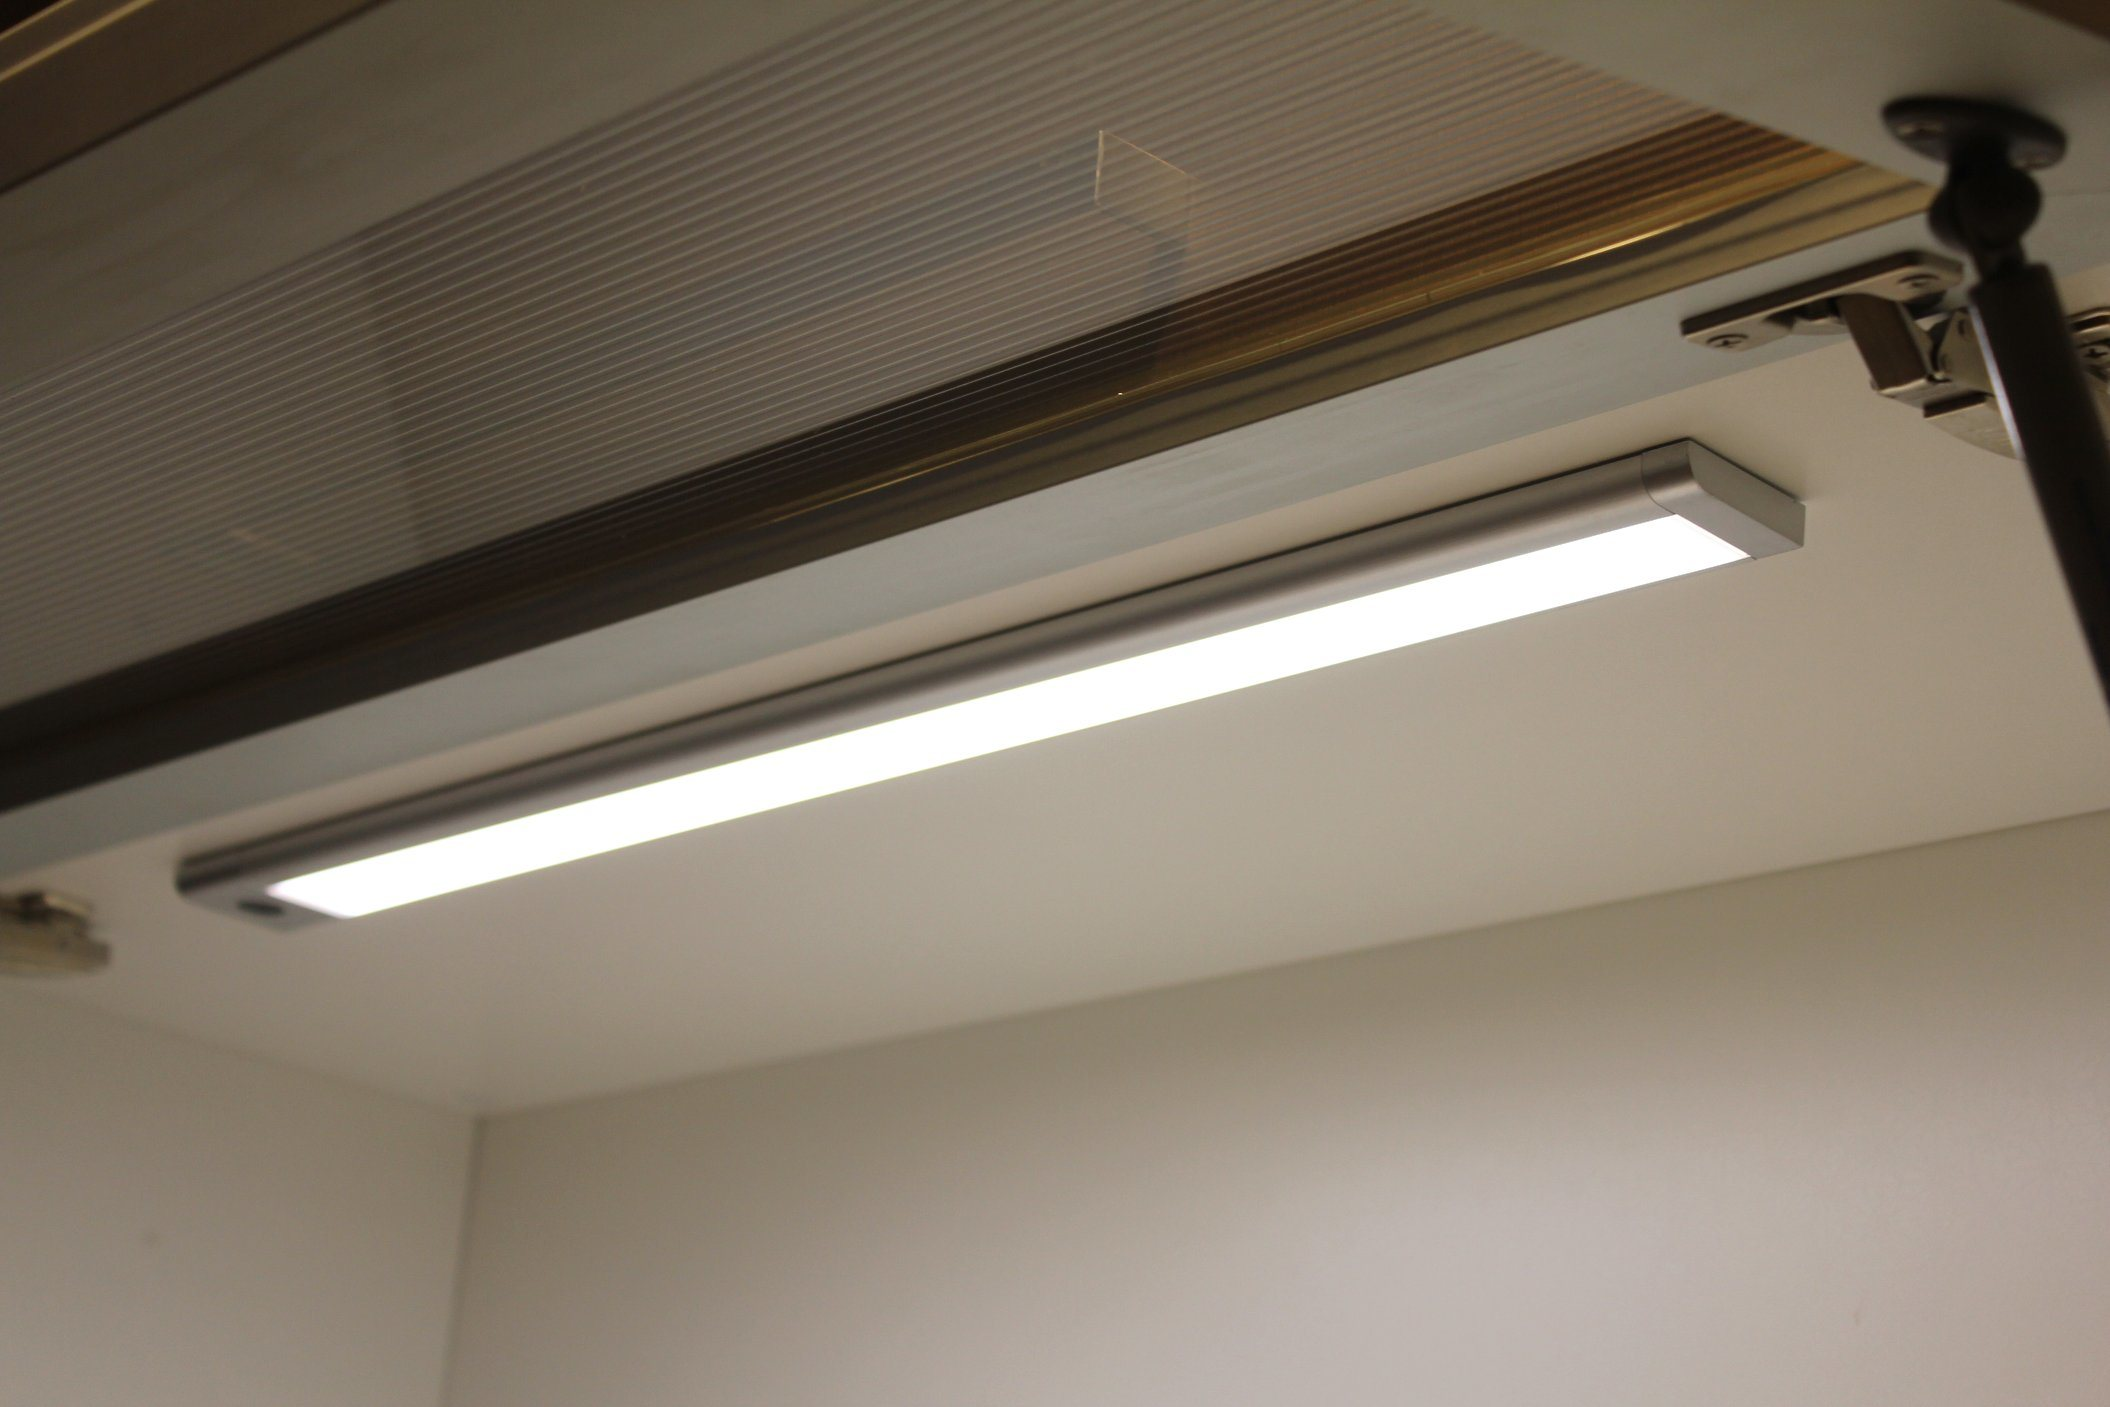 DC12V Sensor LED Cabinet Light or Wardrobe Light